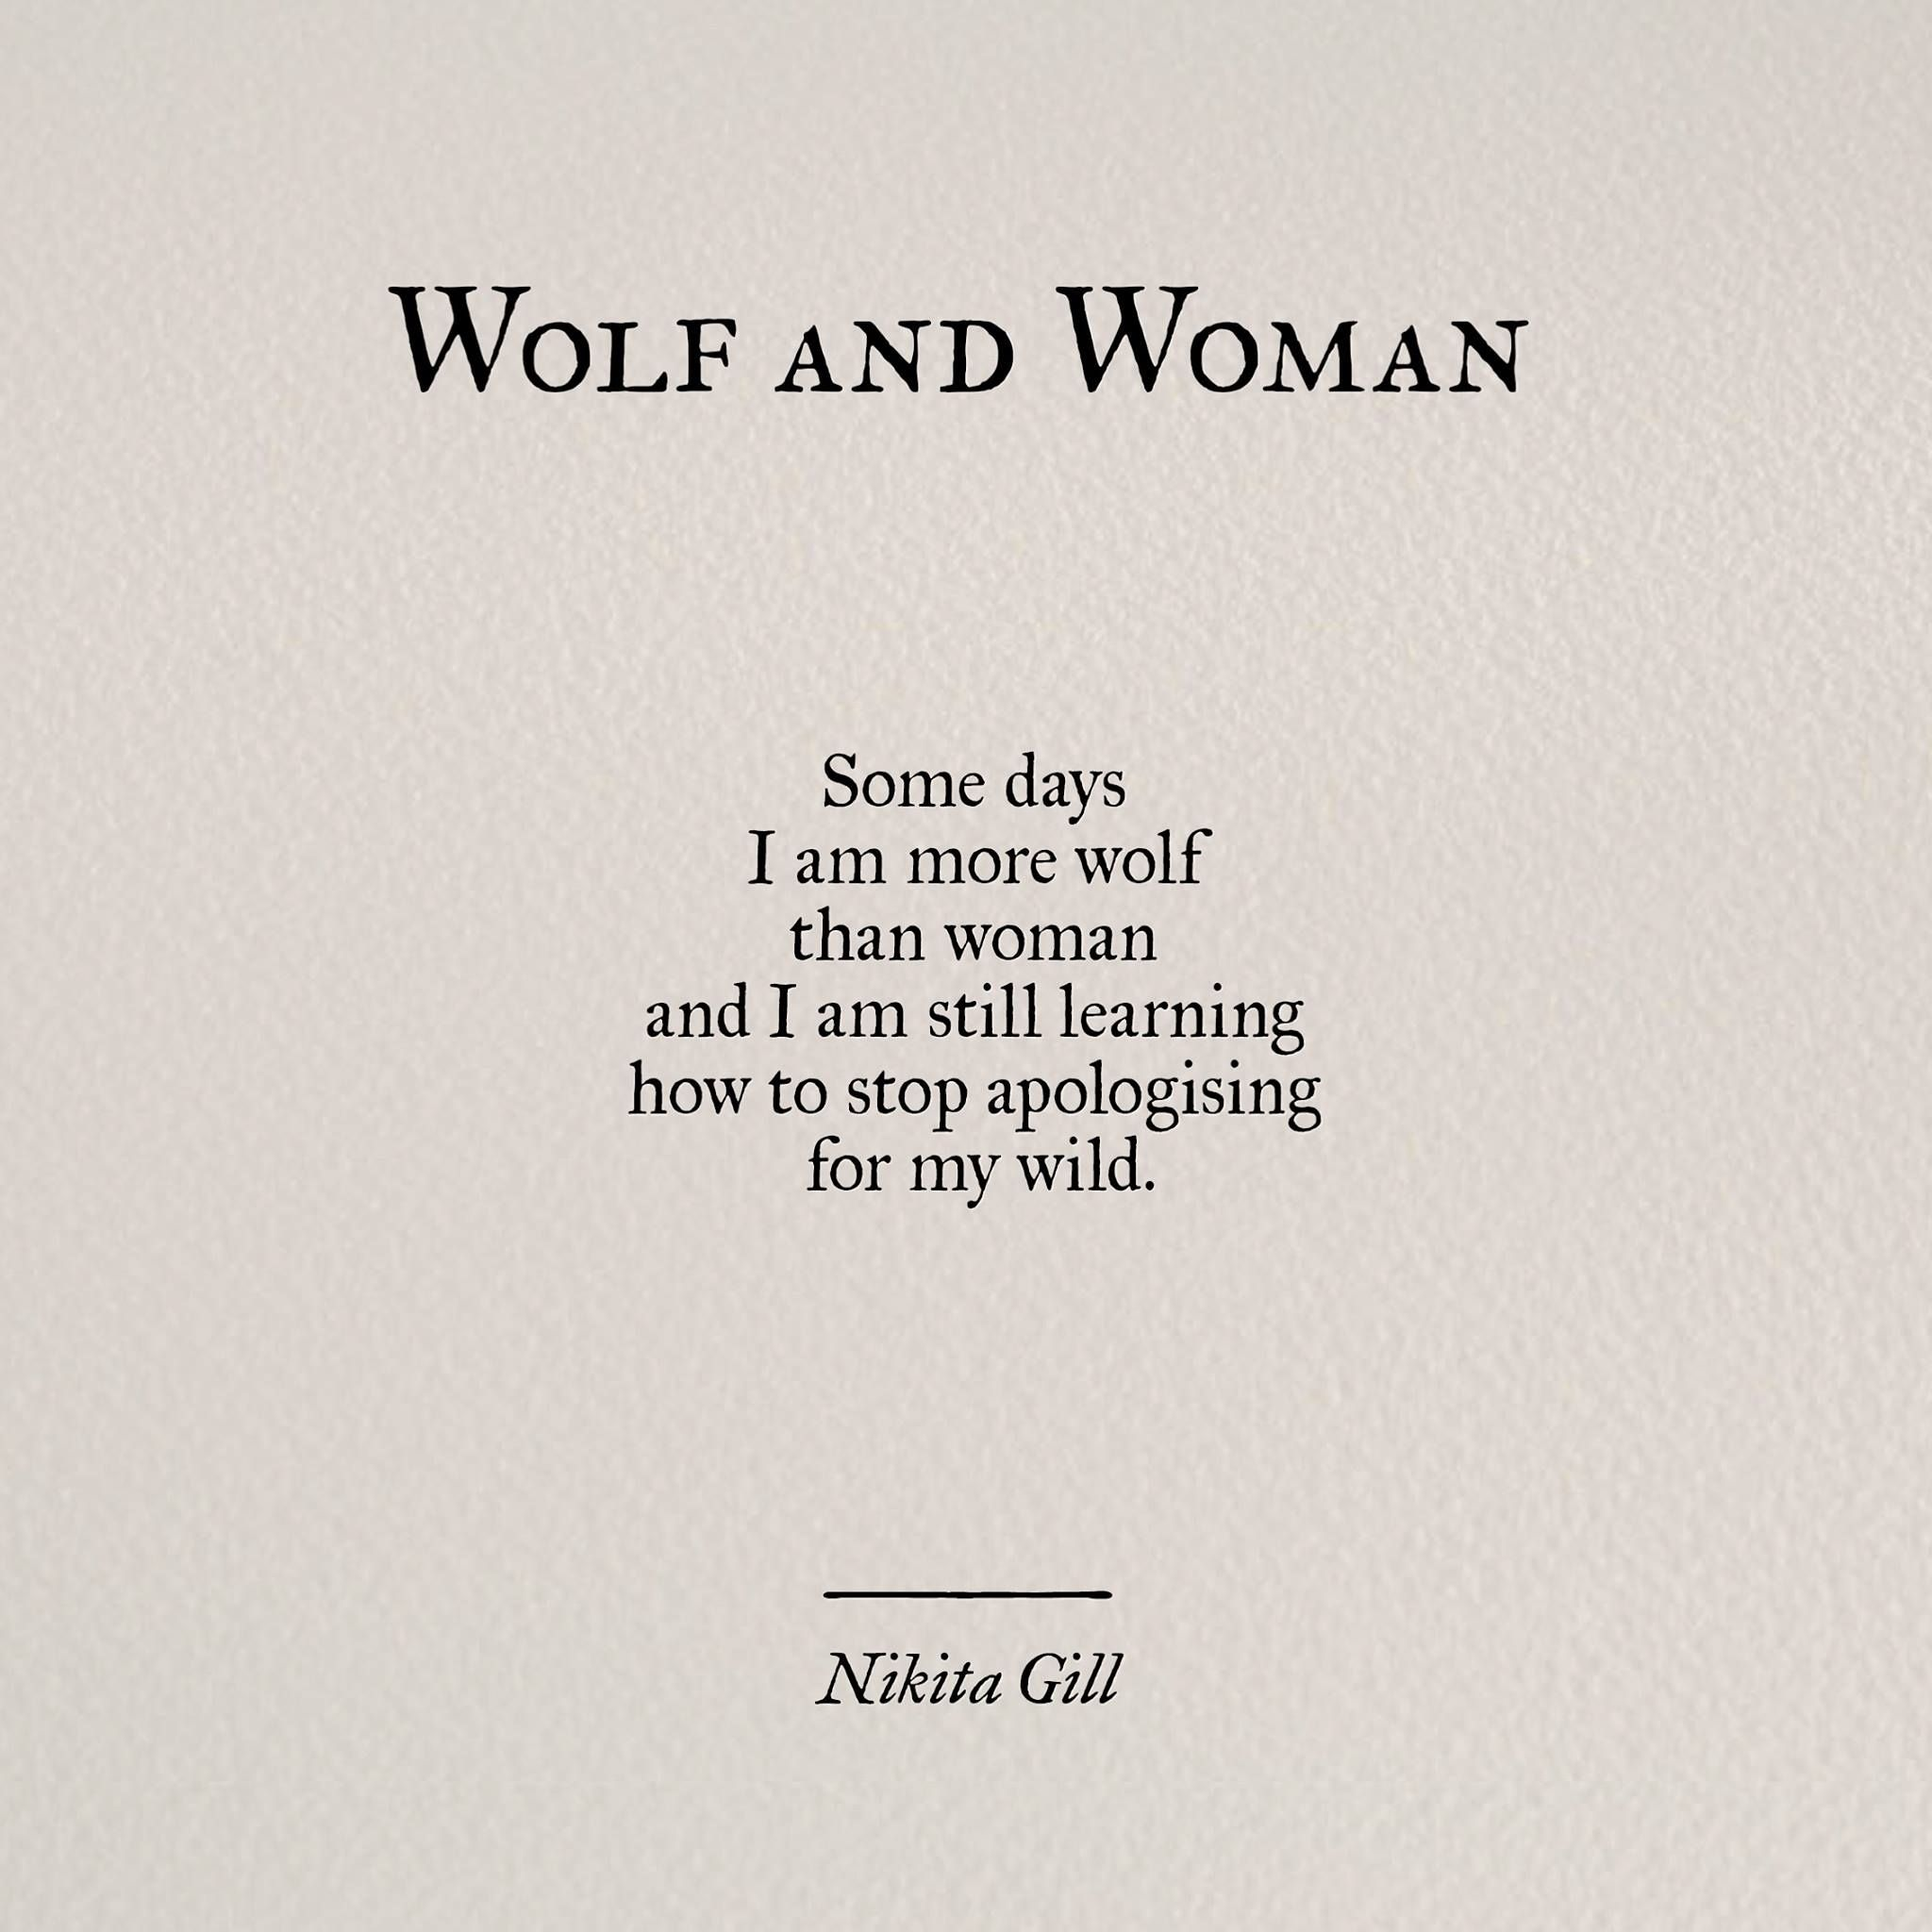 "Woman Quotes Wolf And Woman"" ~ Nikita Gill  Words  Pinterest  Nikita Gill ."